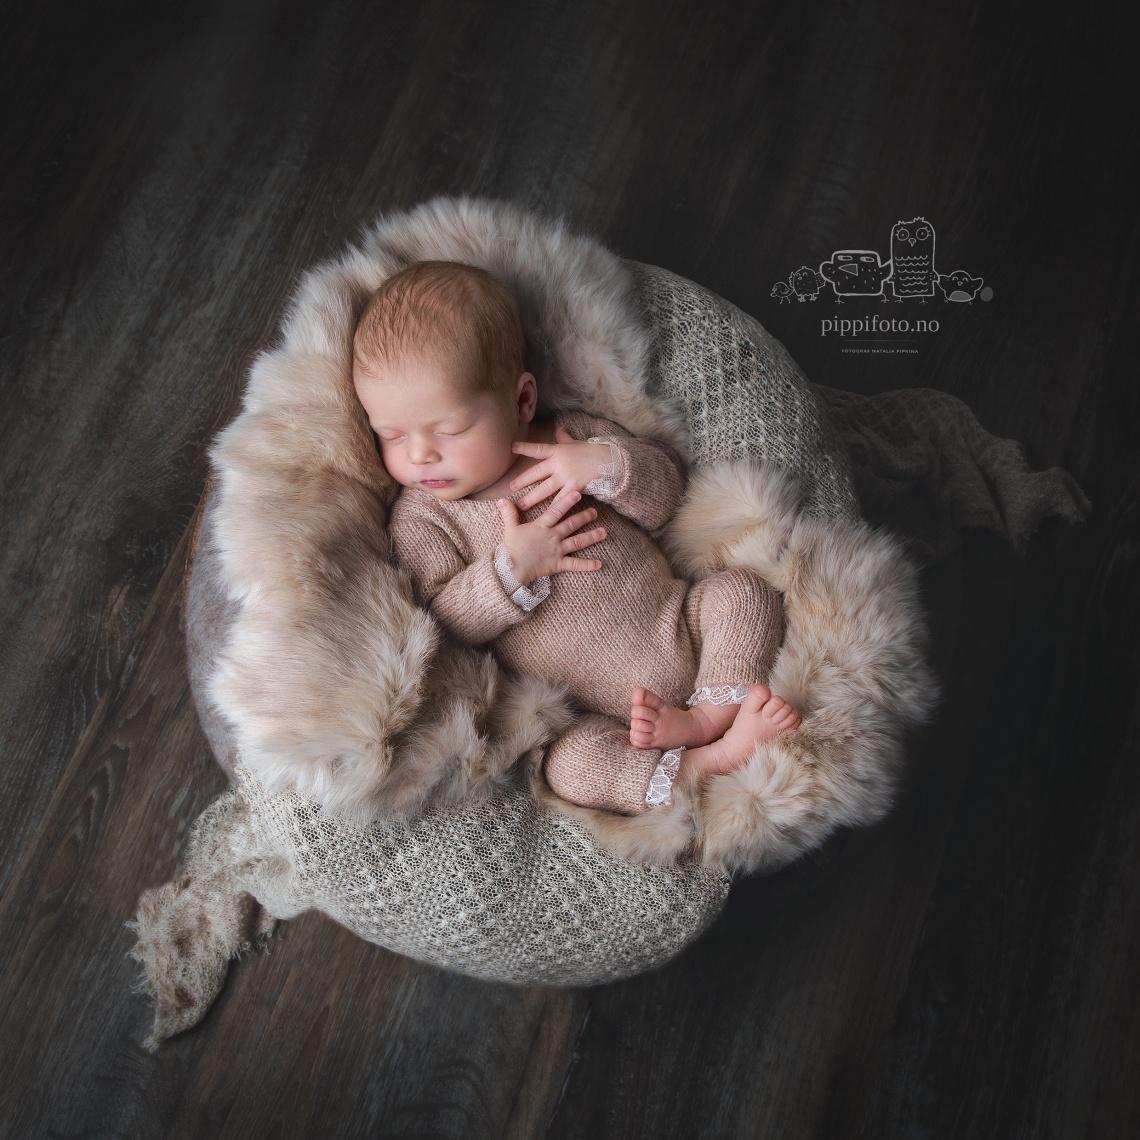 nyfødtfotografering-Oslo-nyfødtfotograf-familiefotografering-oppegård-follo-oslo